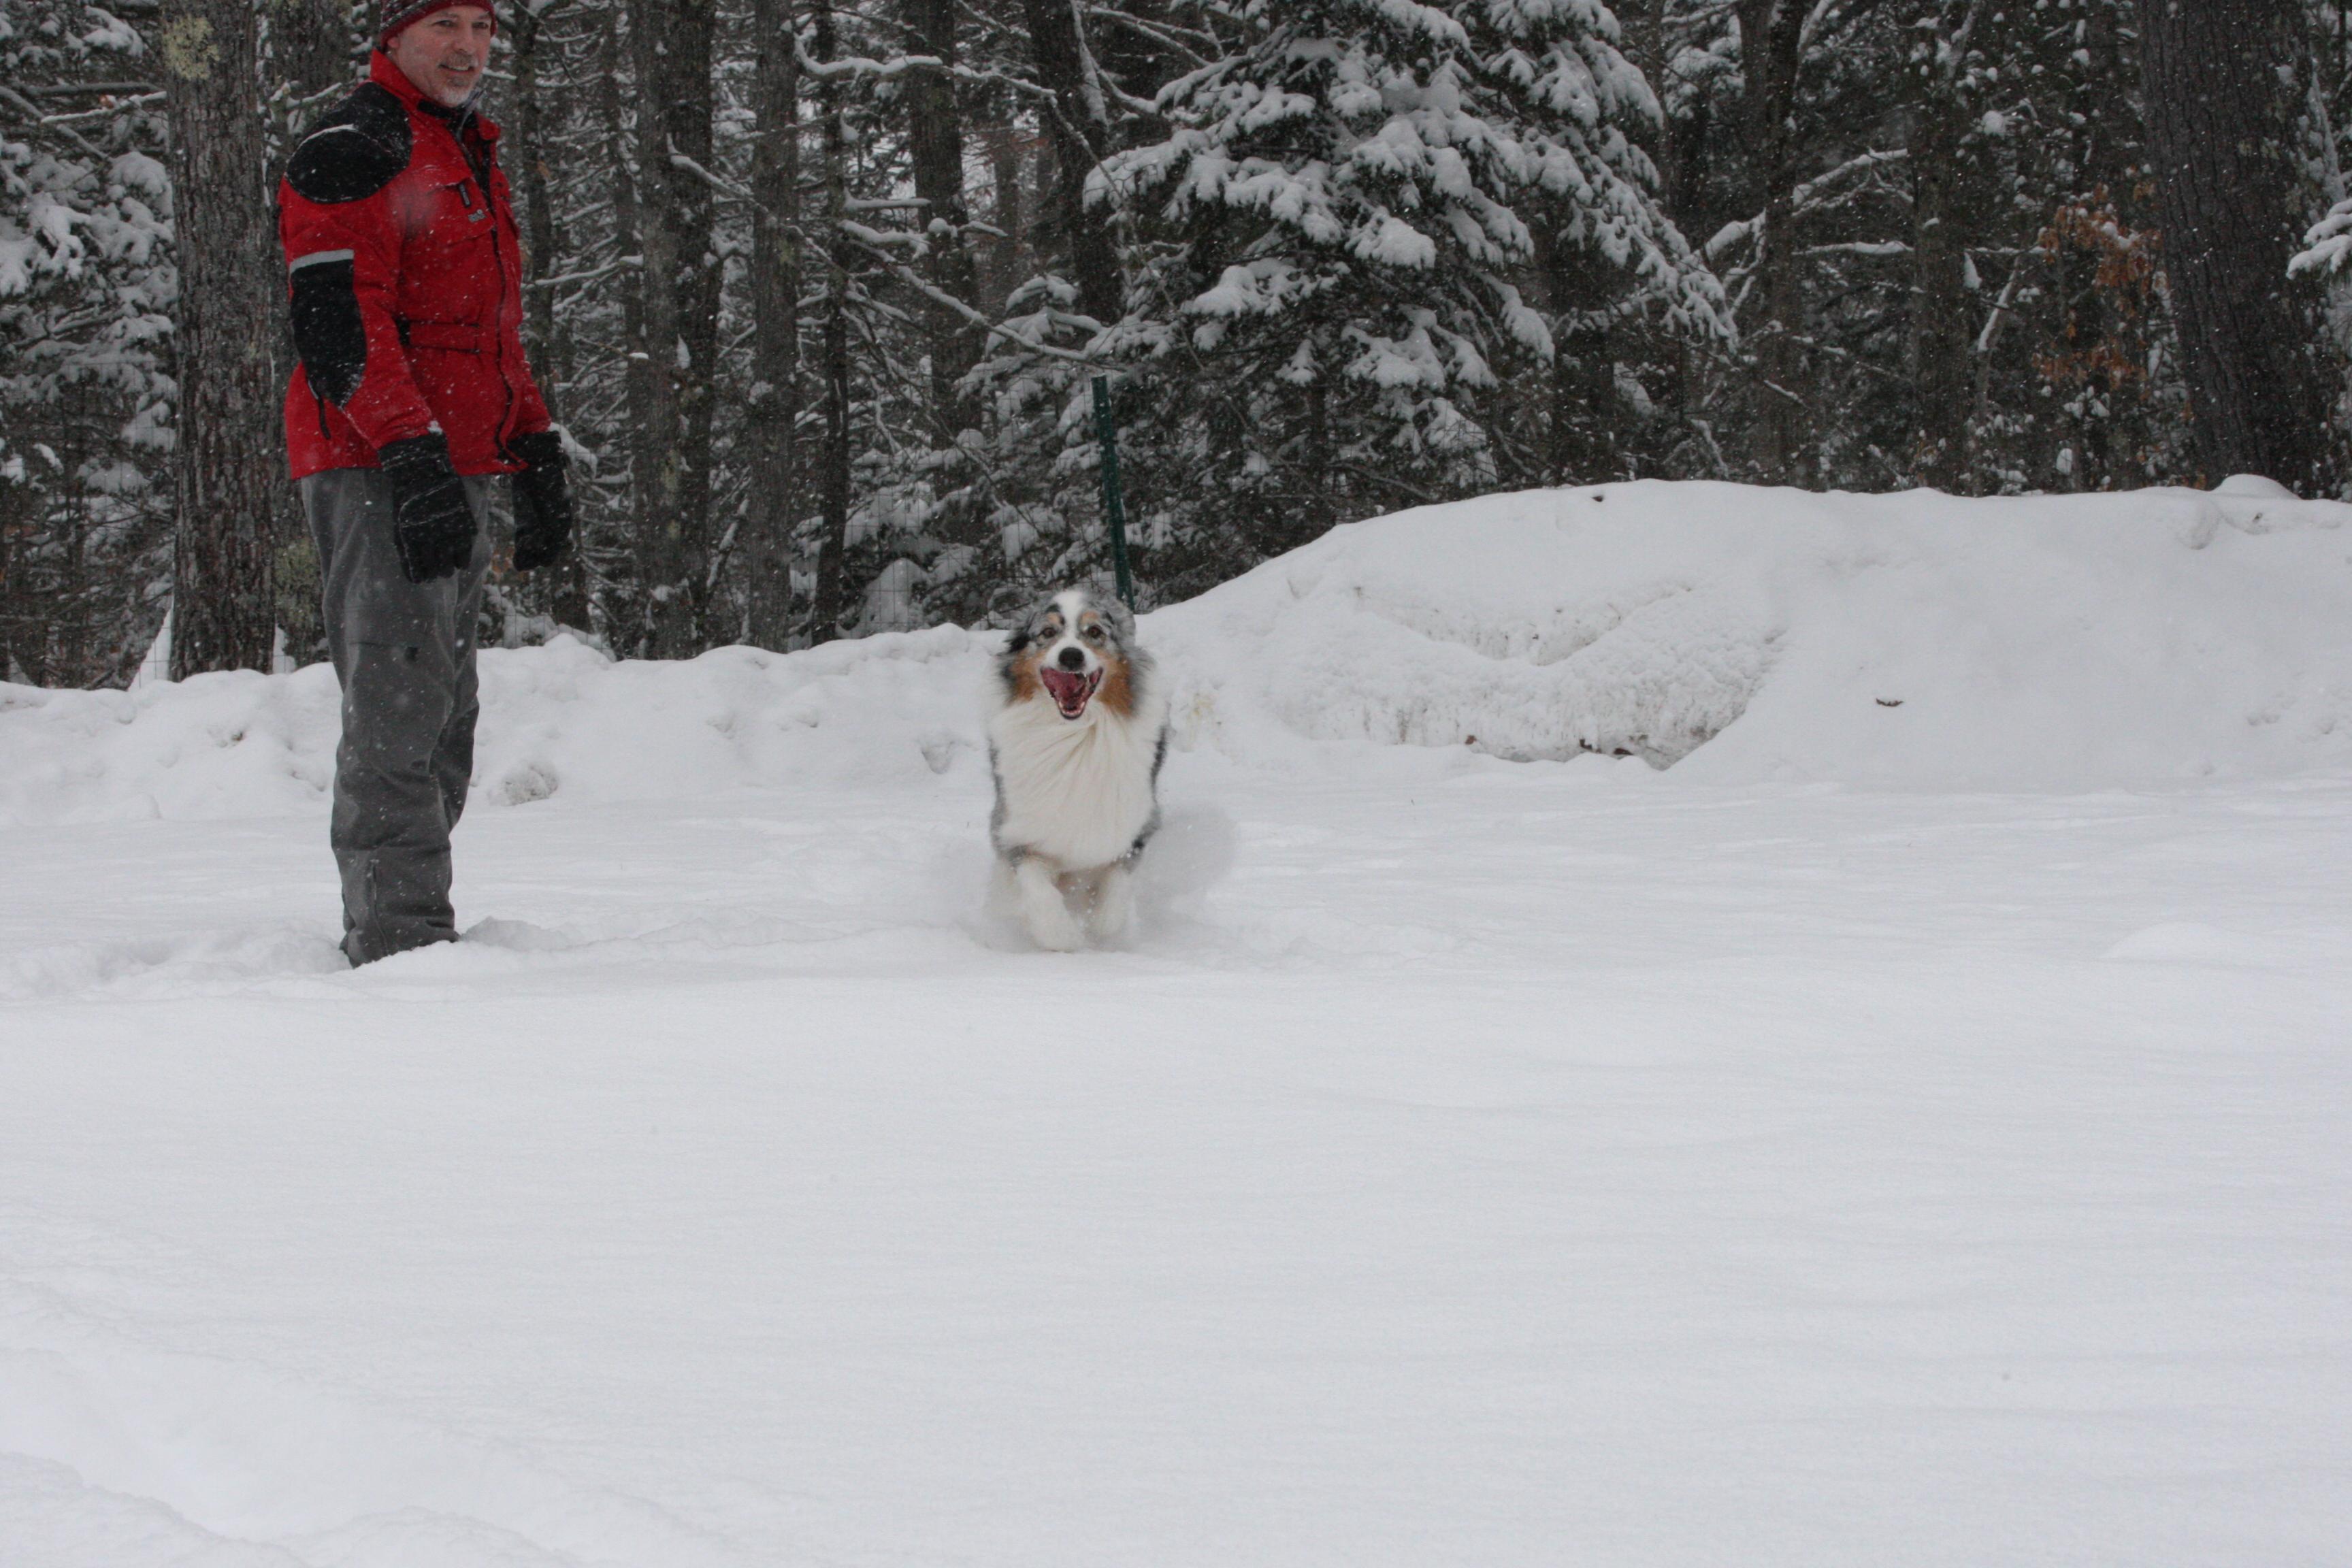 Dogs Feb 11, 2017 (11)